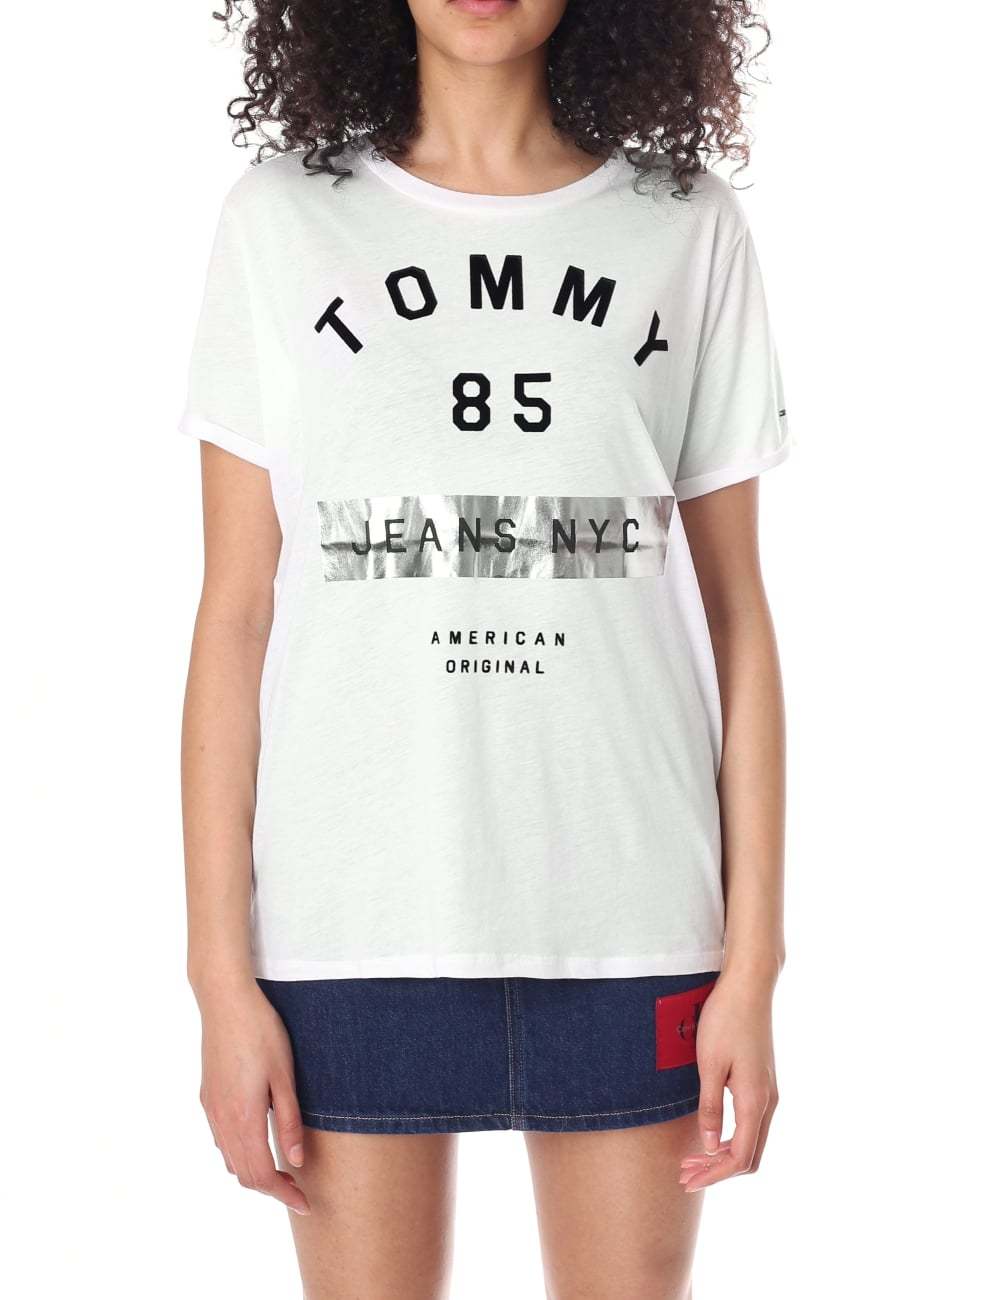 9ff35fe80 Logo Tee. Women's Foil ... Tees & Knits White – Tommy Hilfiger ...